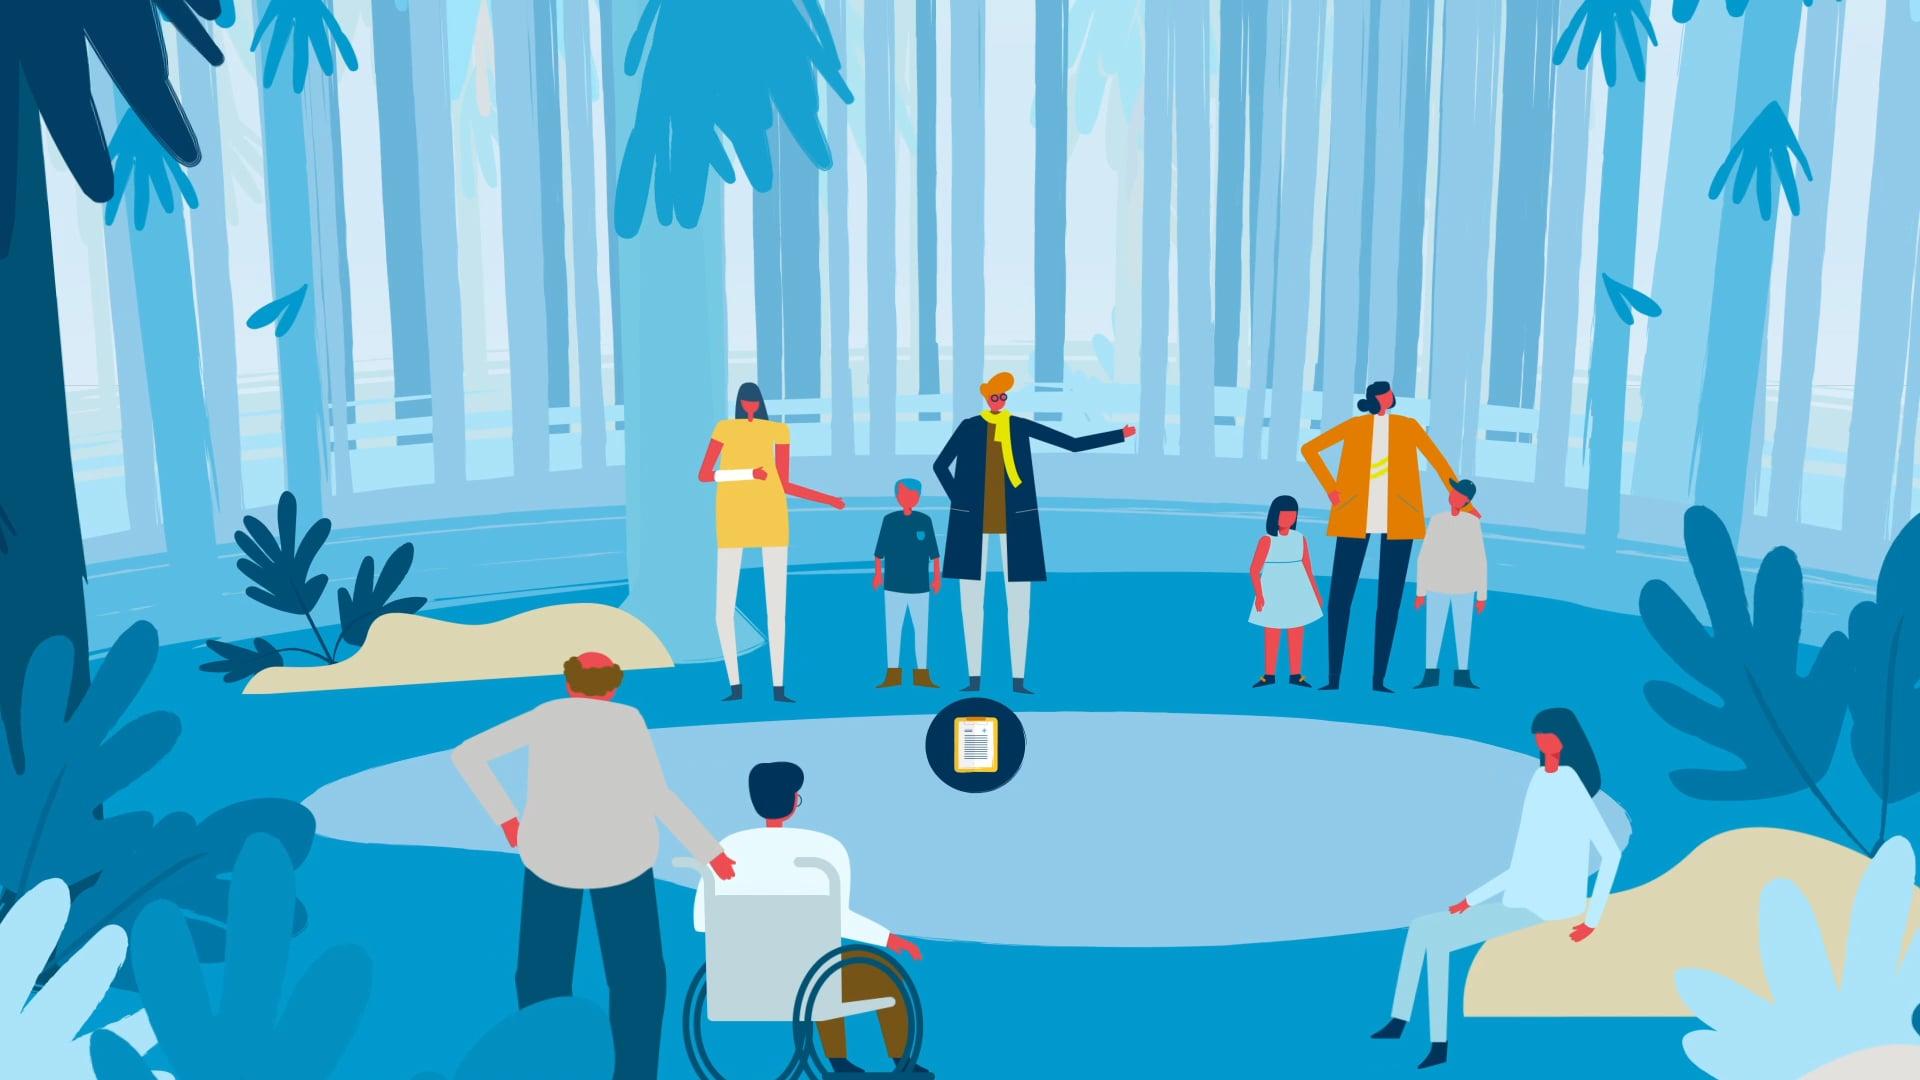 Blue Cross Blue Shield - Health Care Sustainability - Mighteor